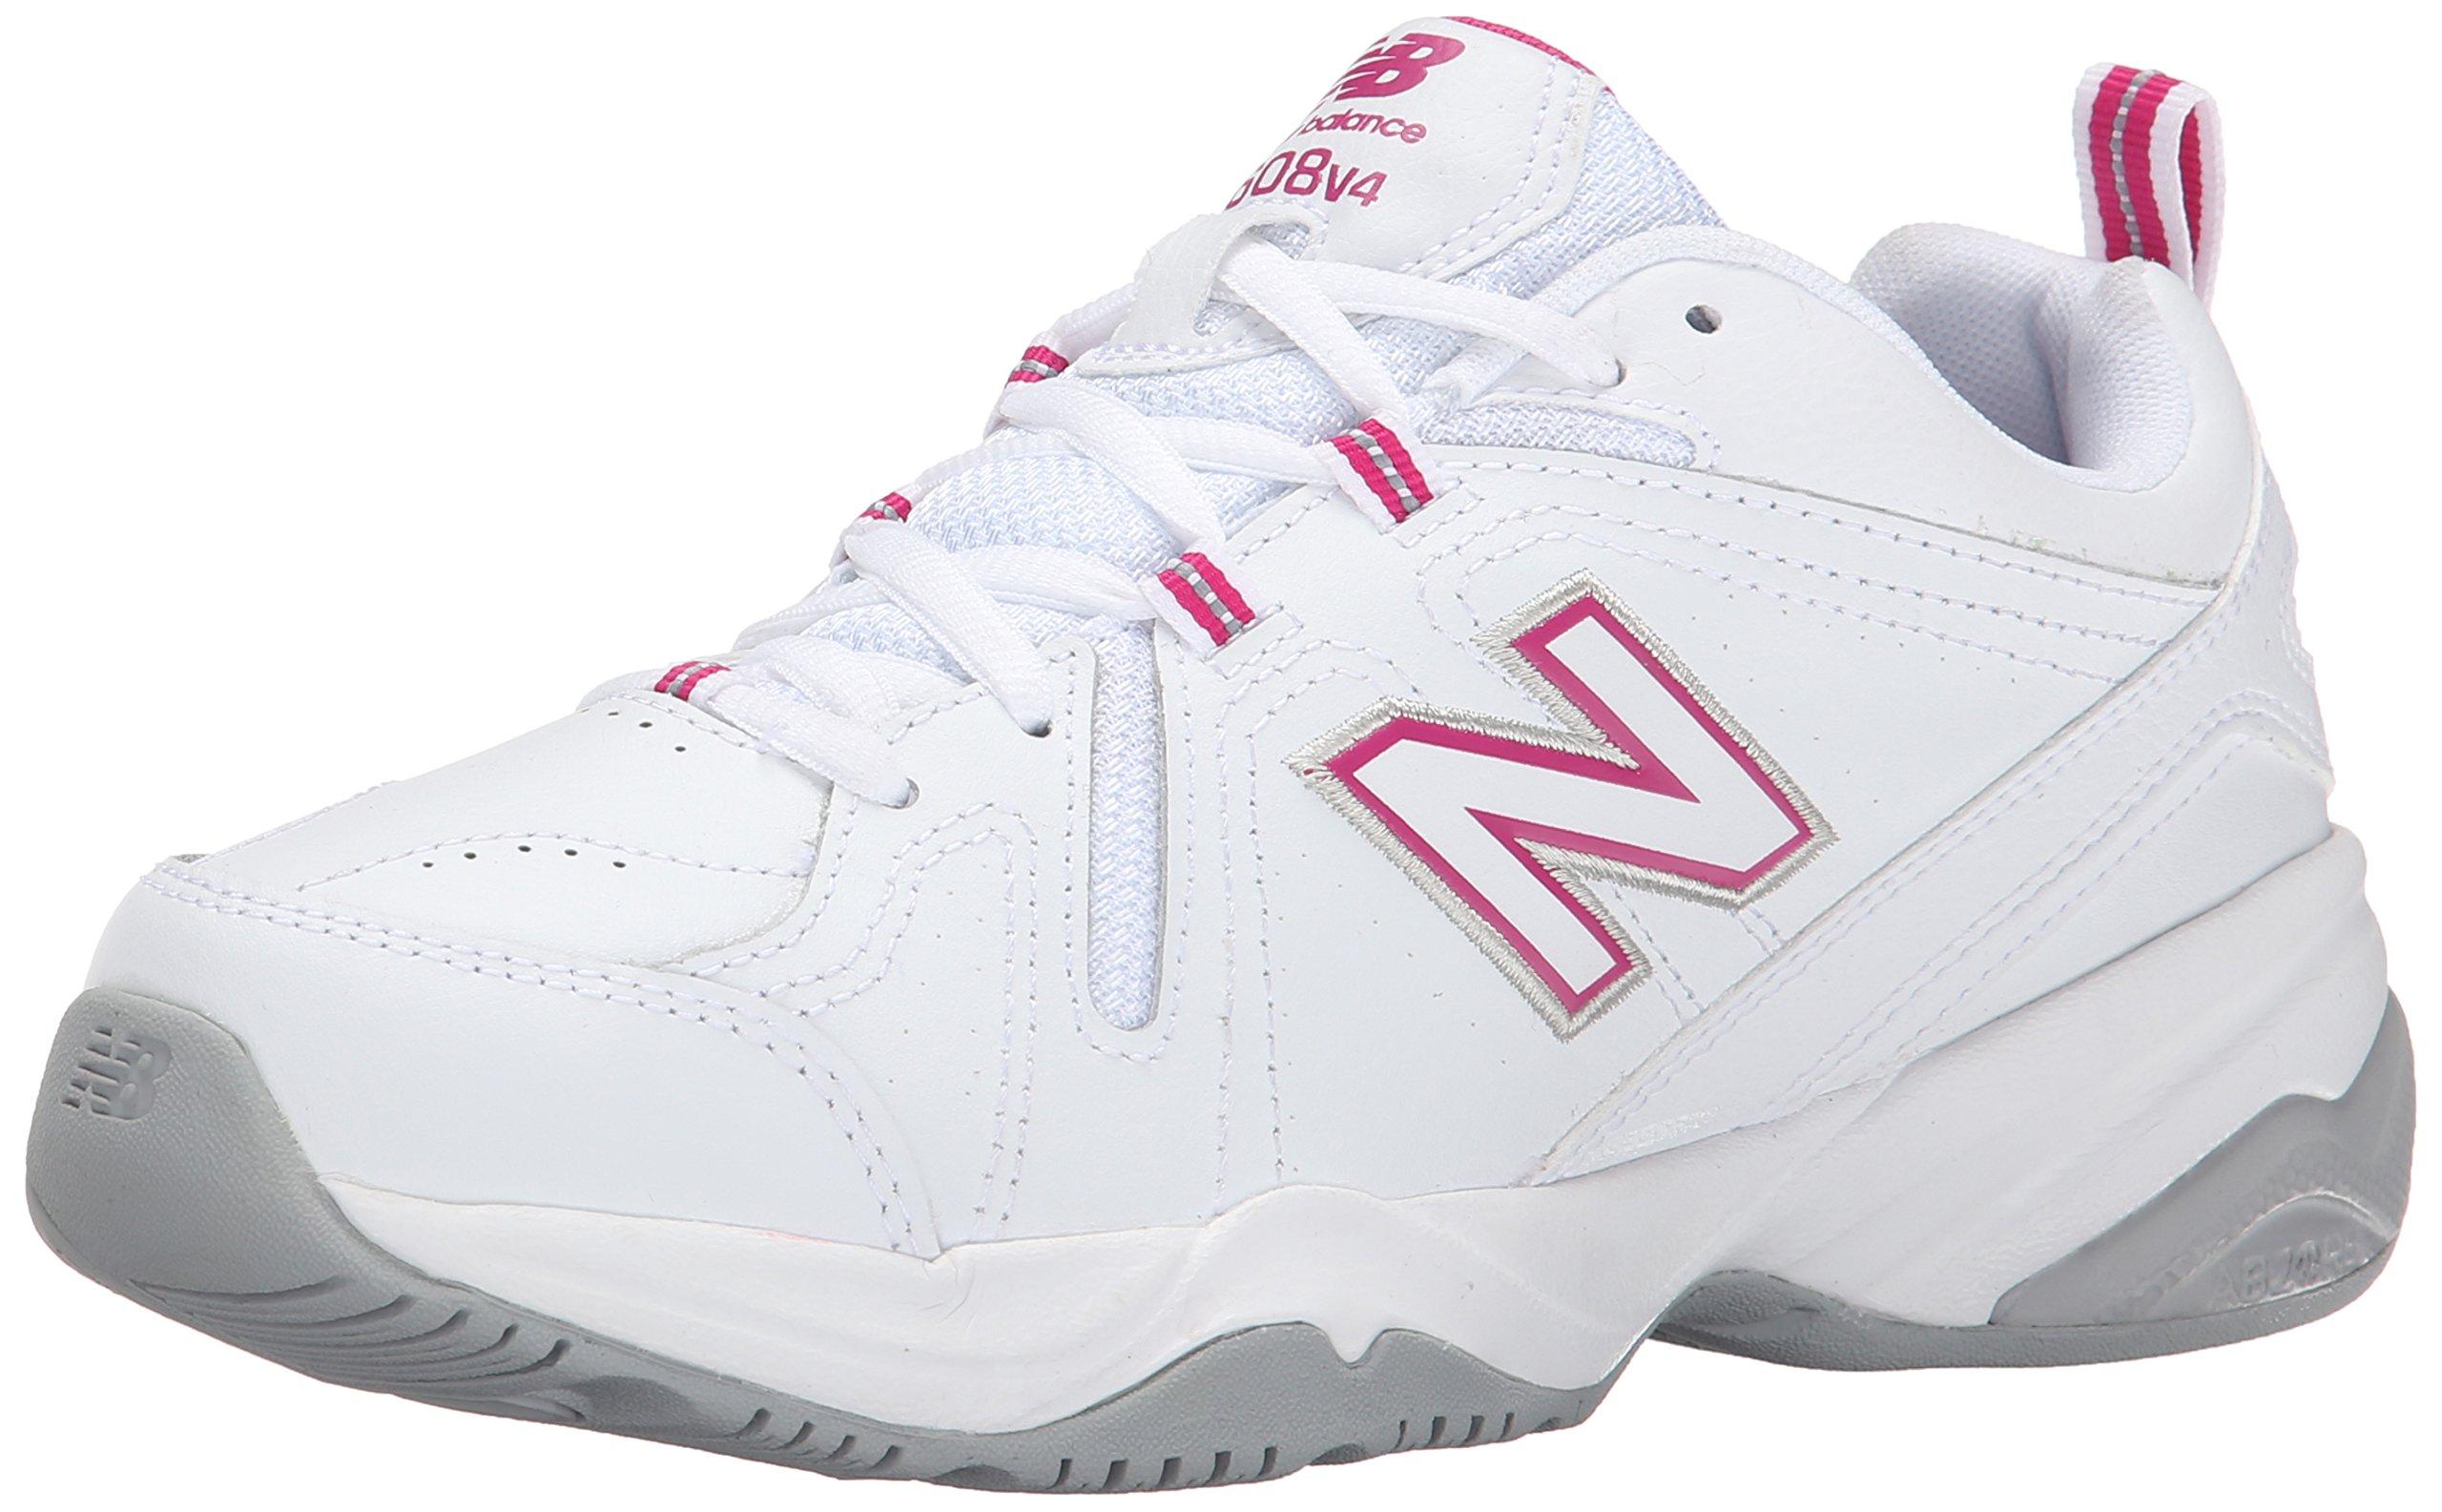 New Balance Women's WX608v4 Training Shoe, White/Pink, 8.5 D US